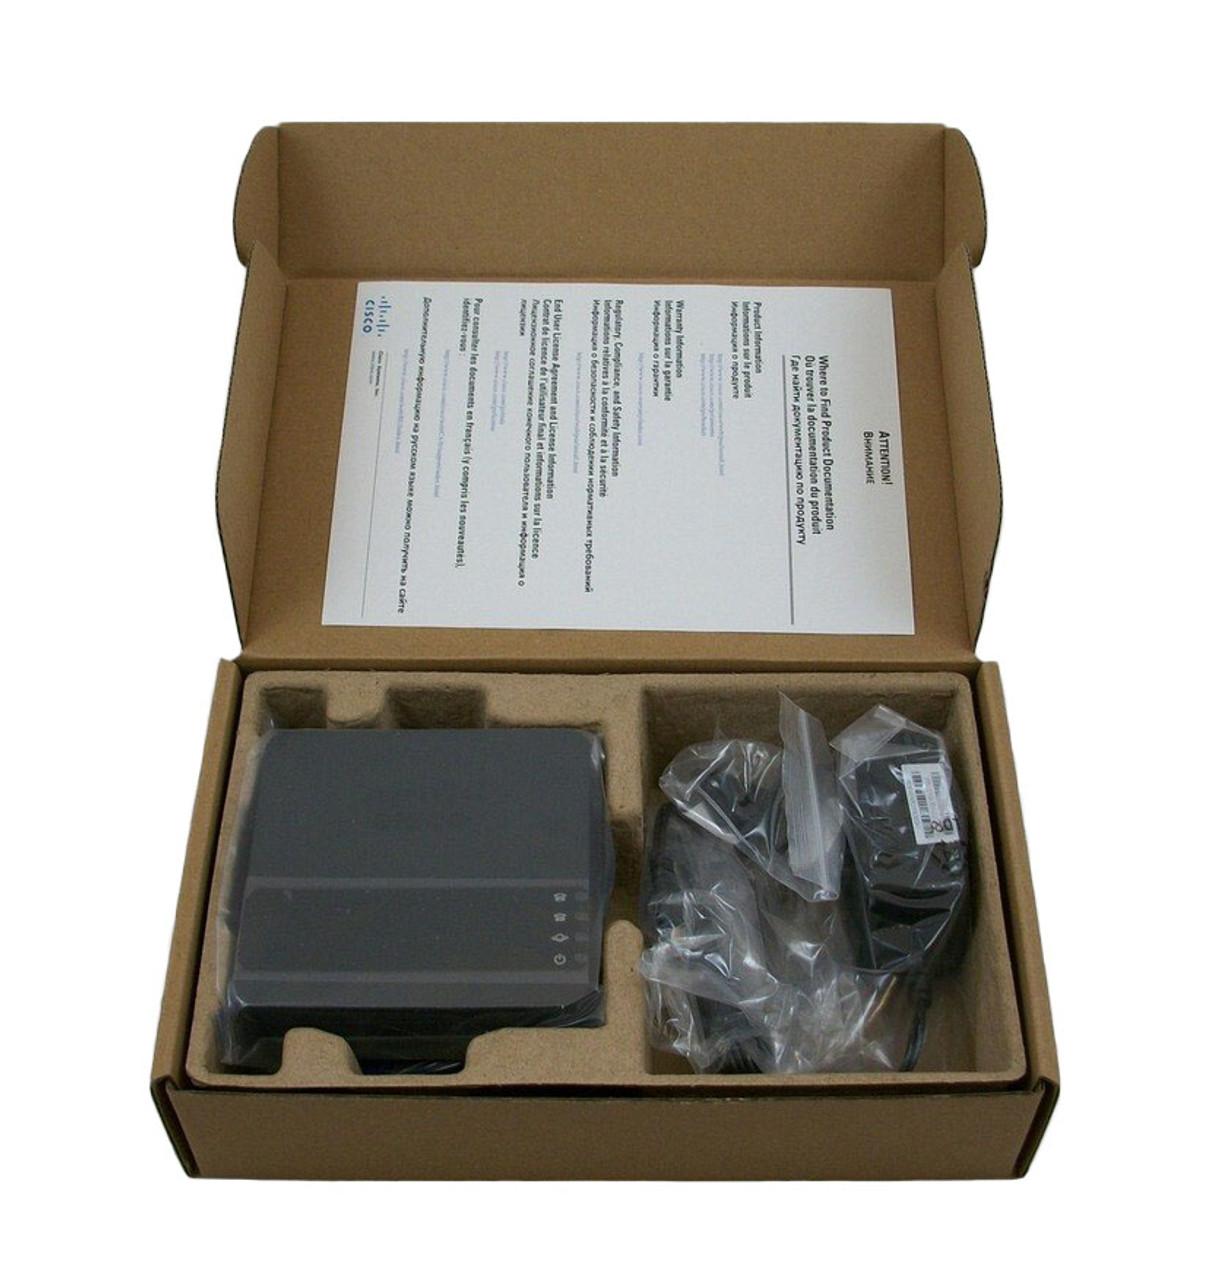 Cisco ATA 190 Analog Telephone Adapter with Power ATA190 New In Box